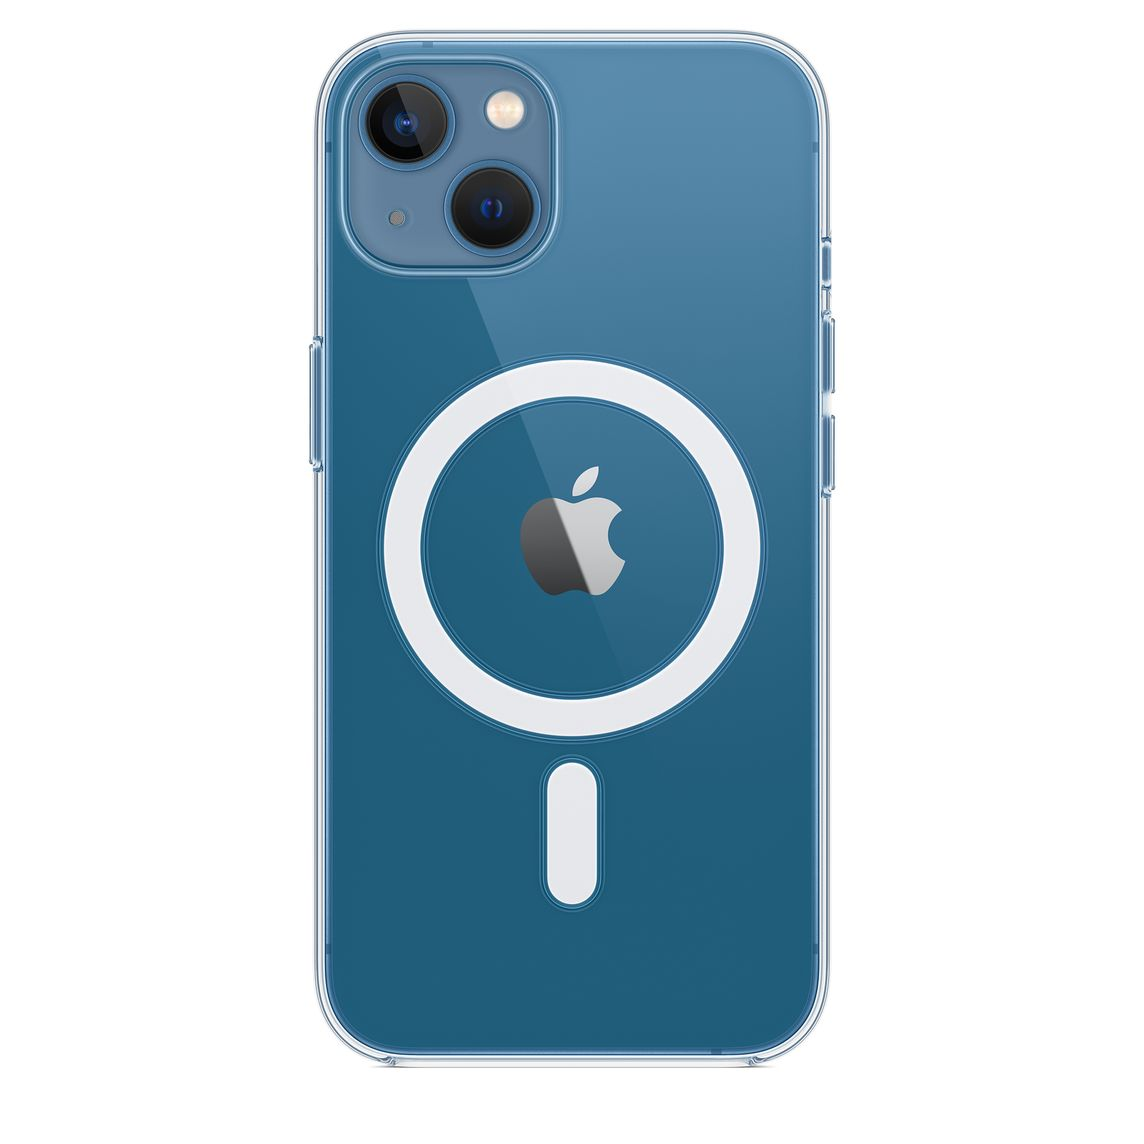 Ốp lưng iPhone 13 Clear Case with MagSafe Chính Hãng